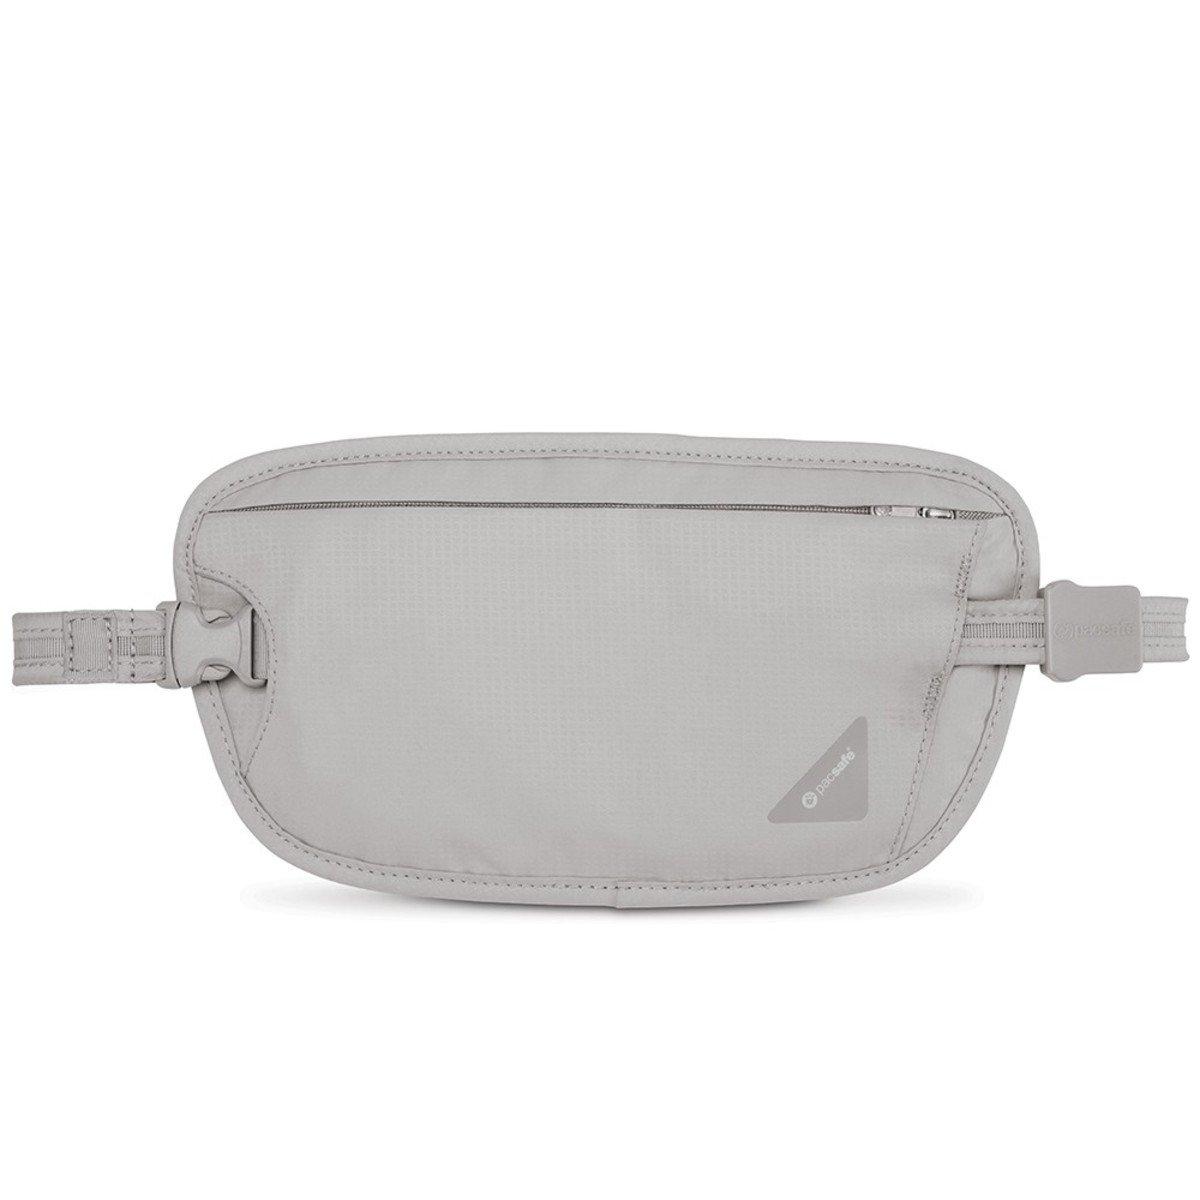 Coversafe™ X100 防盜貼身掛腰袋 (灰色)